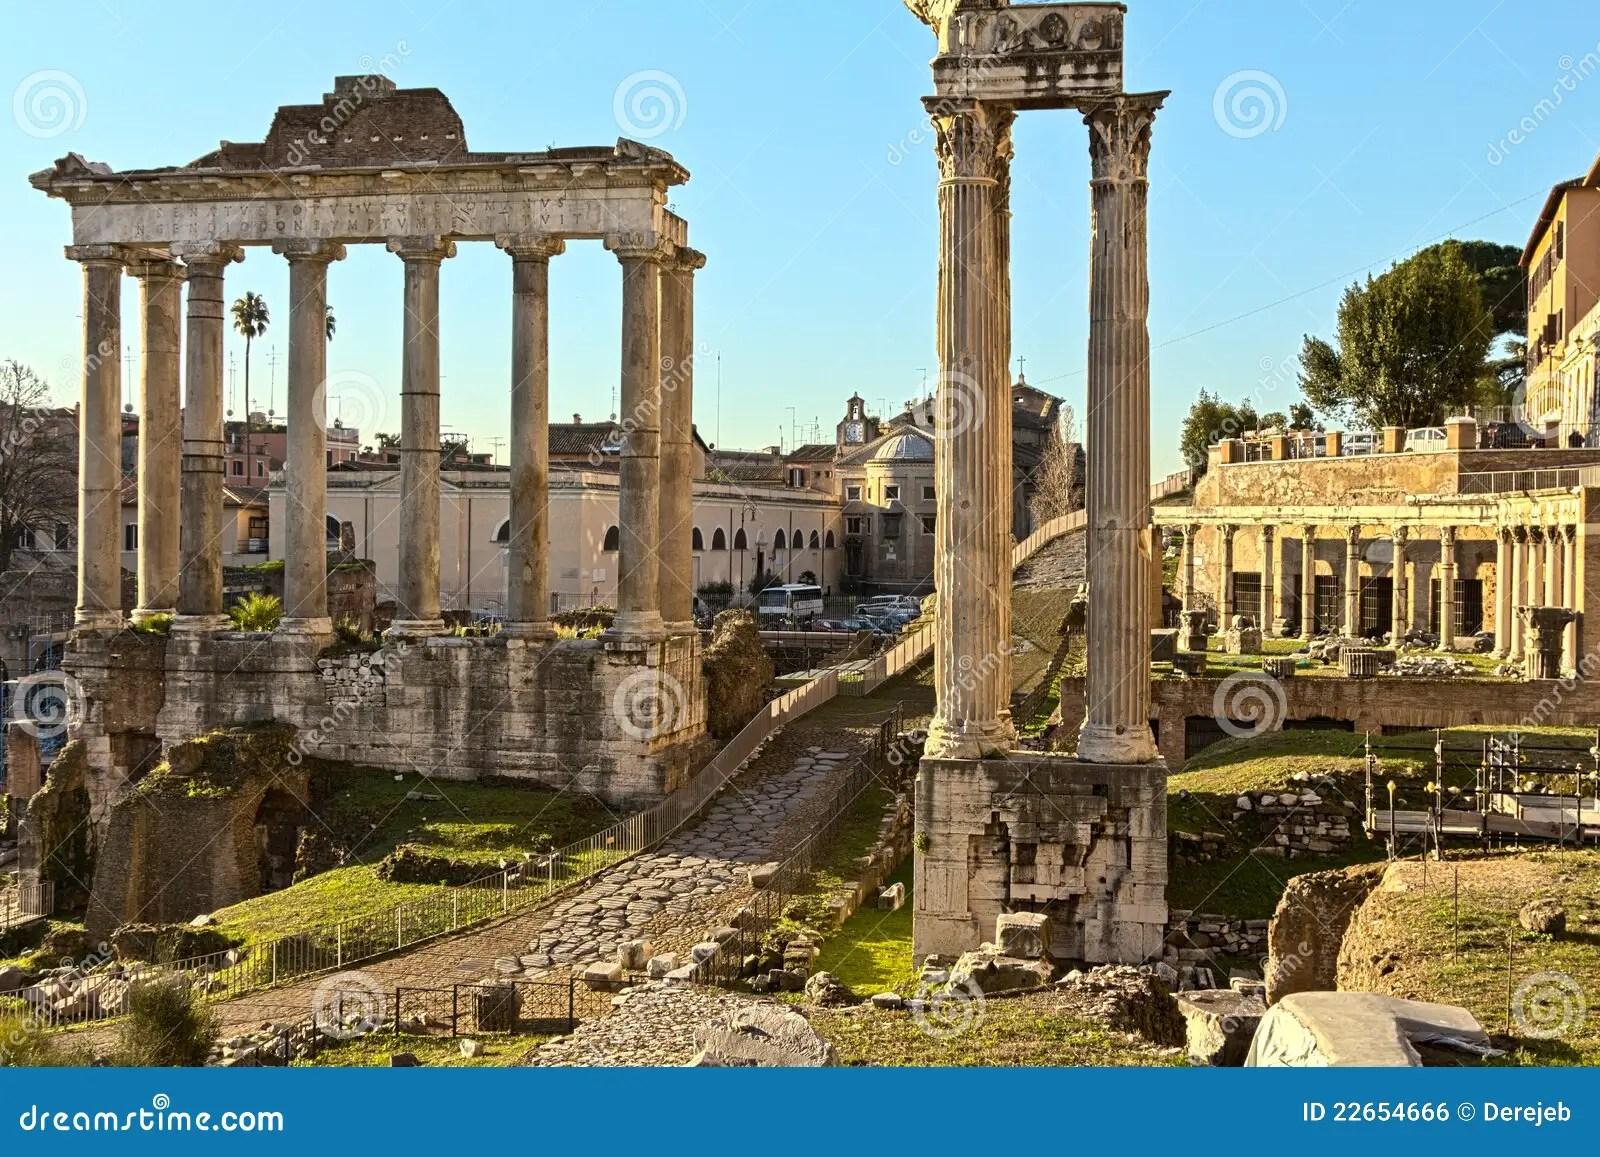 Ancient Rome Ruins Stock Photo Image Of Vesta Rome